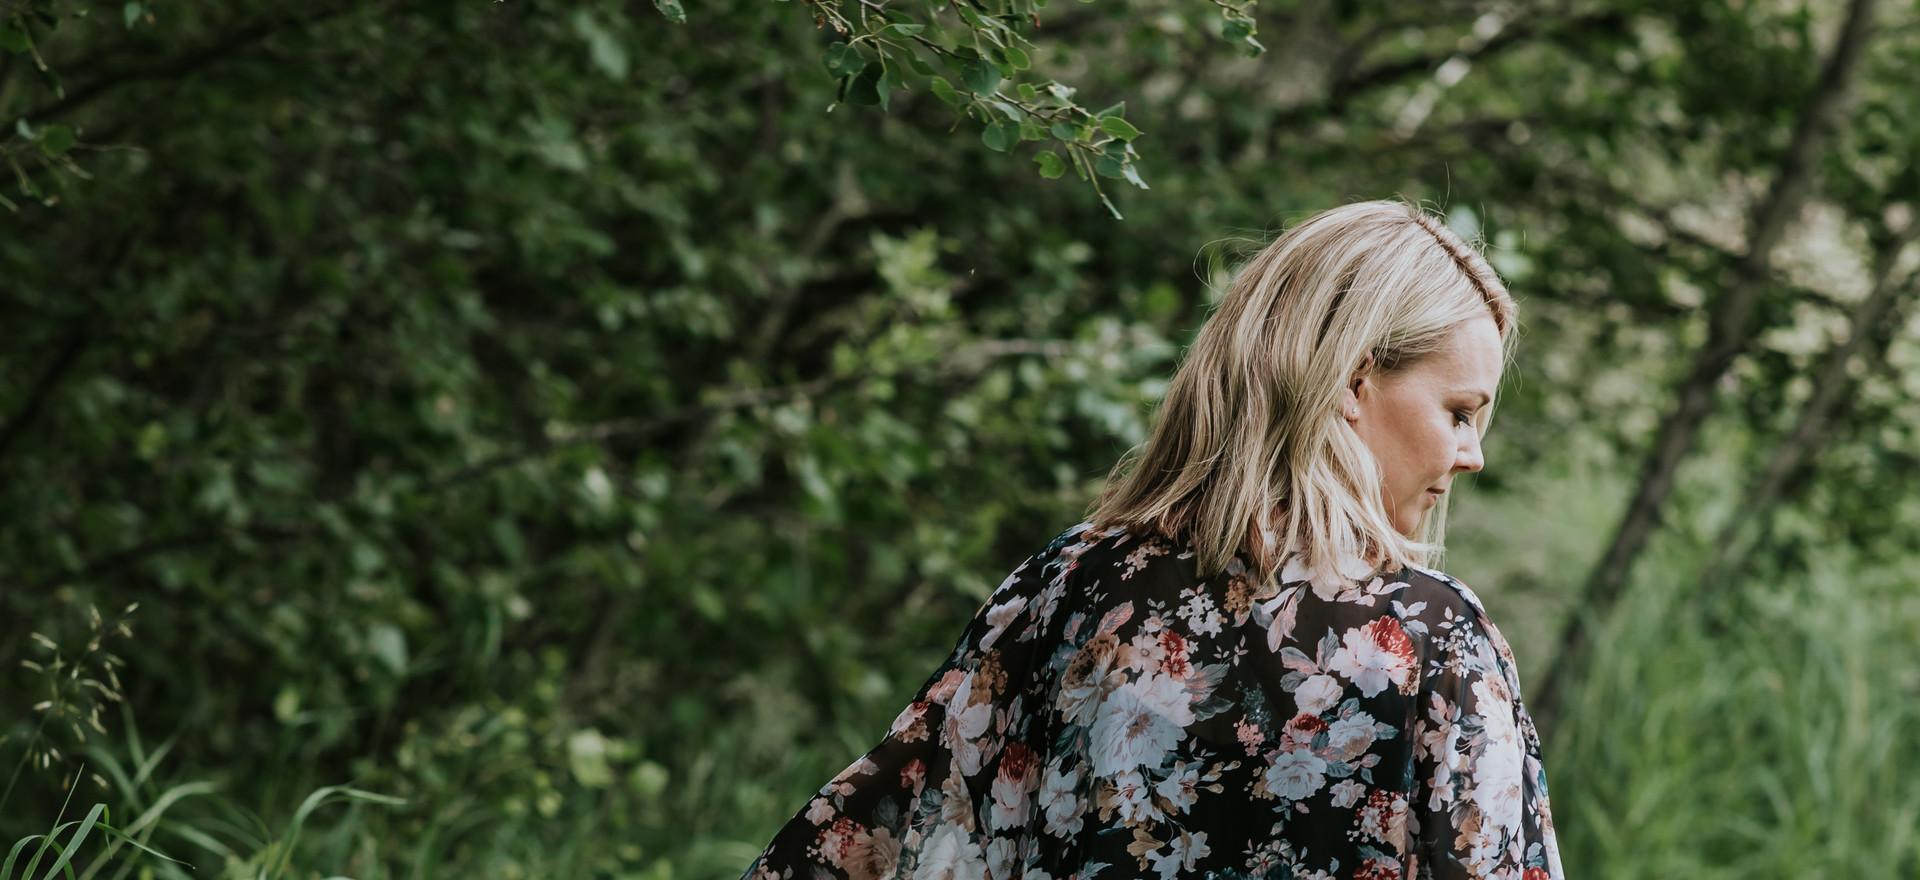 JanineDeanna--KelseyD--2020-31.jpg